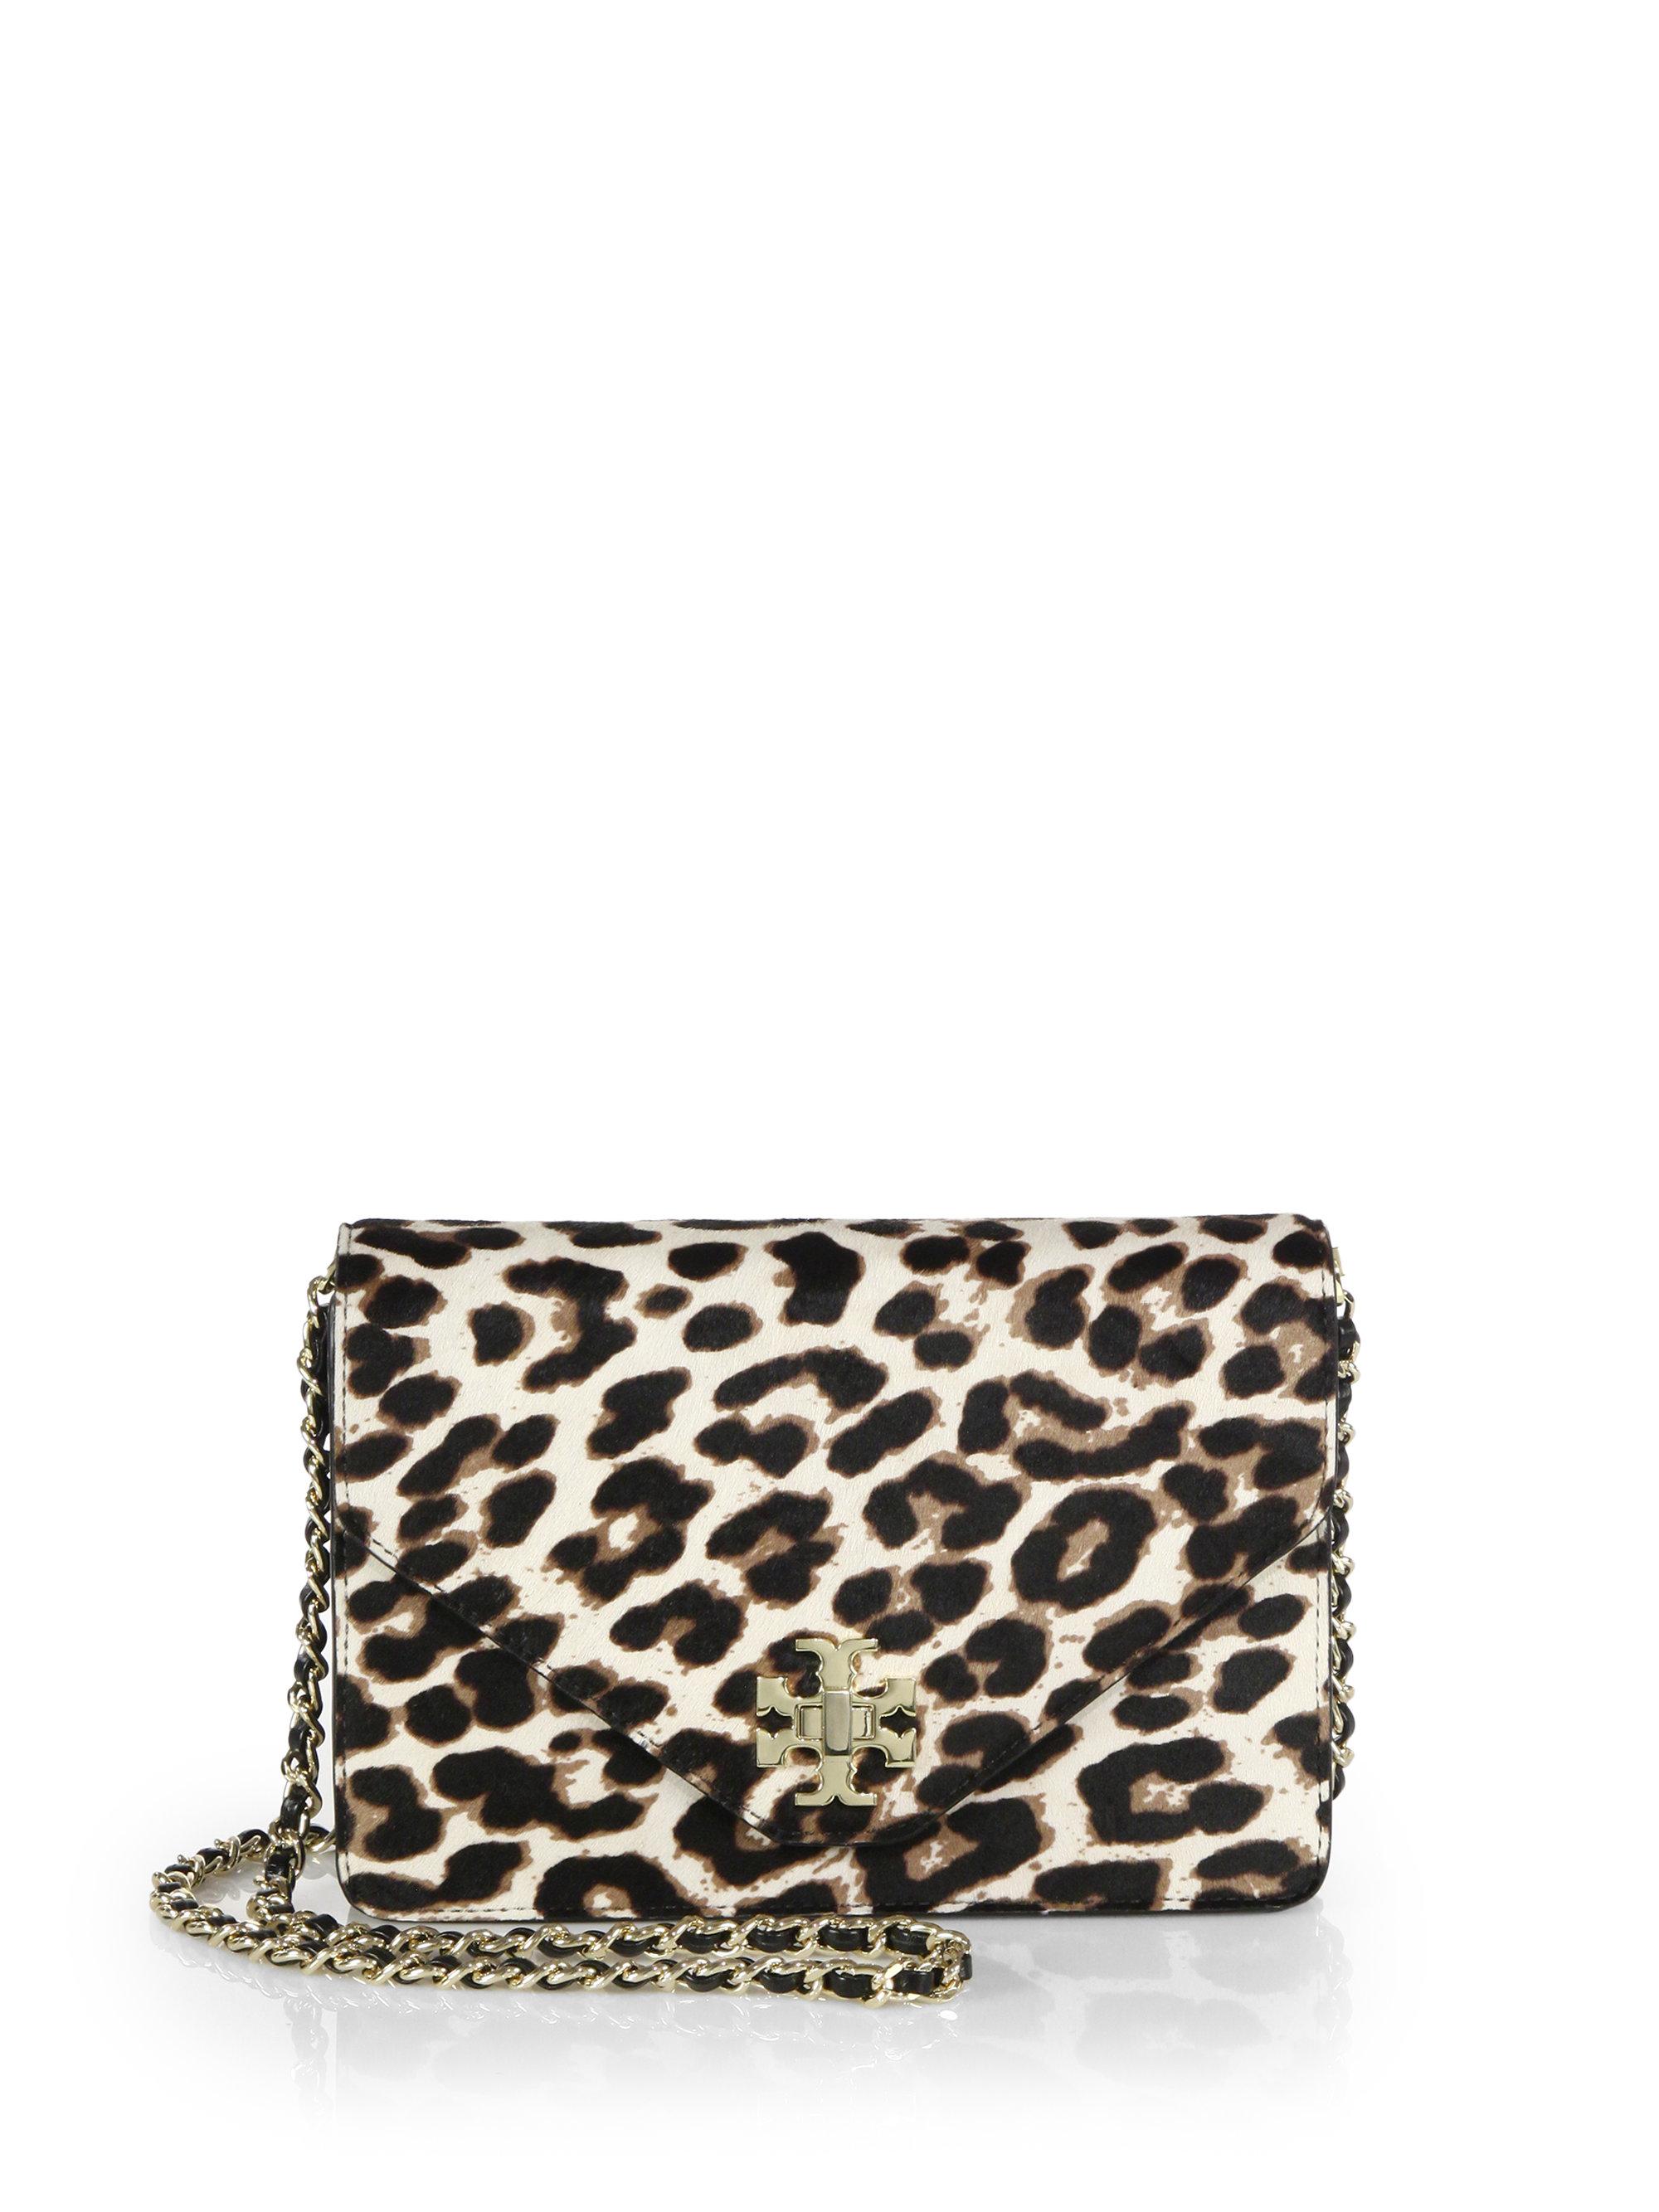 f117c5abf73 ... cheap lyst tory burch kira leopard print calf hair envelope crossbody  bag 65c5a edc4e